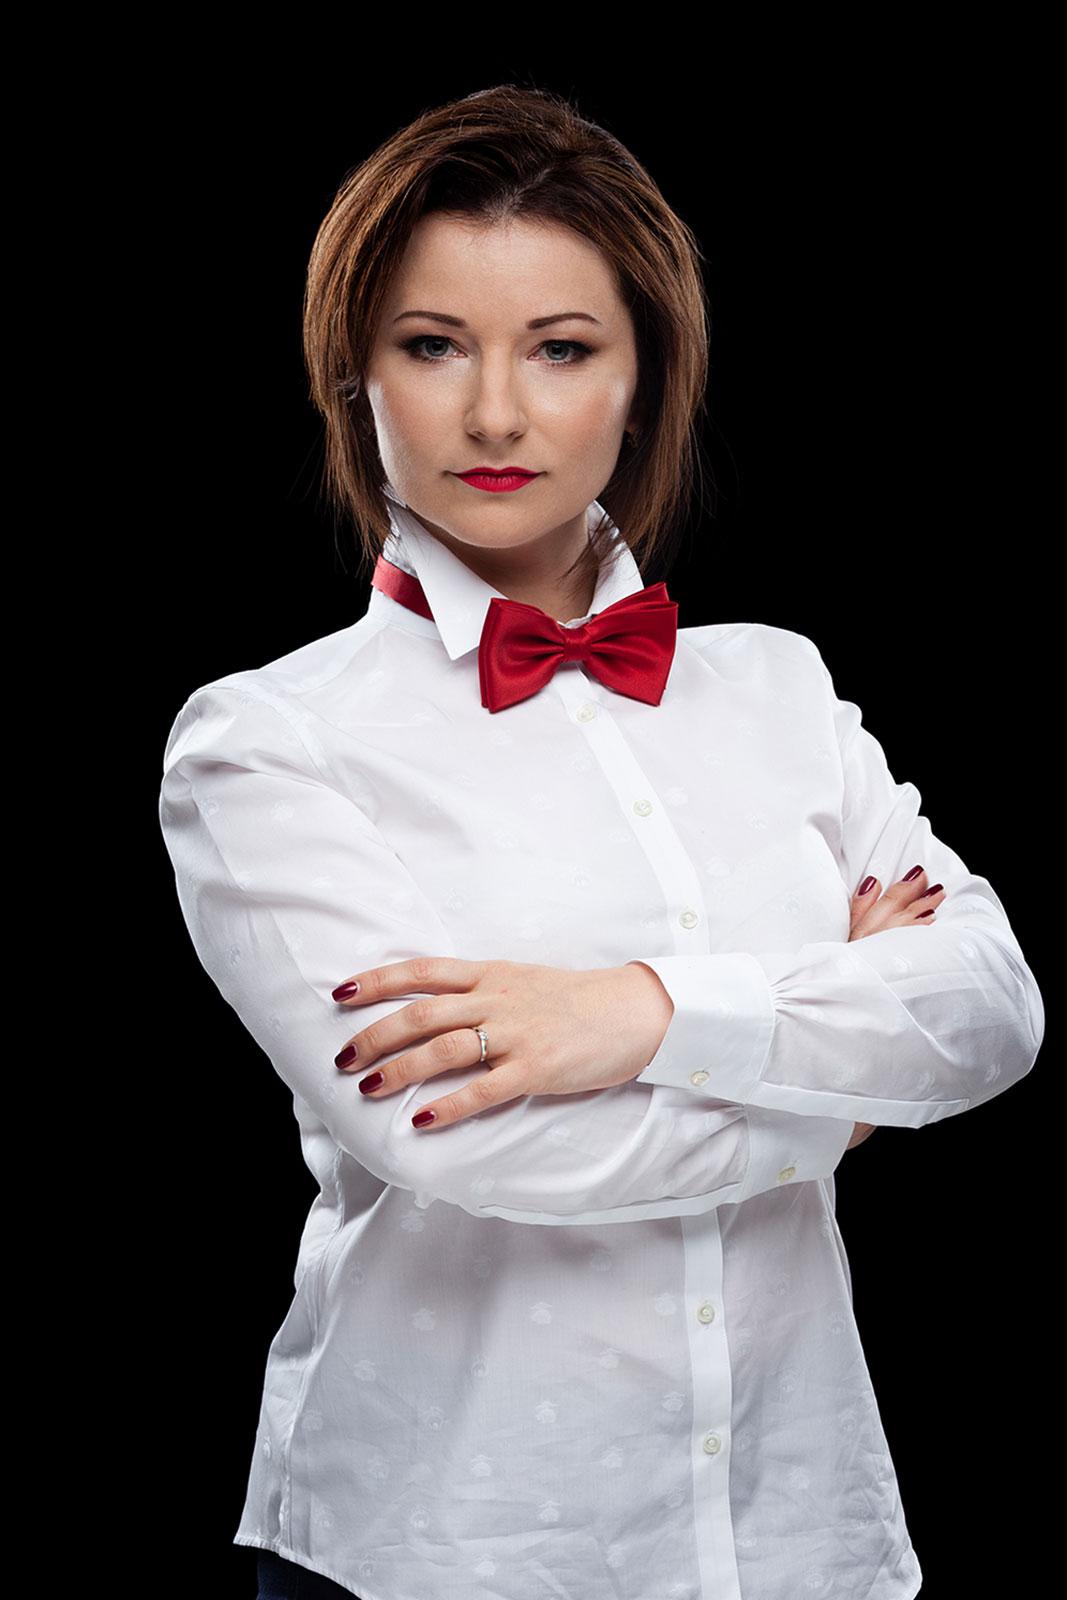 Julia Smirnova